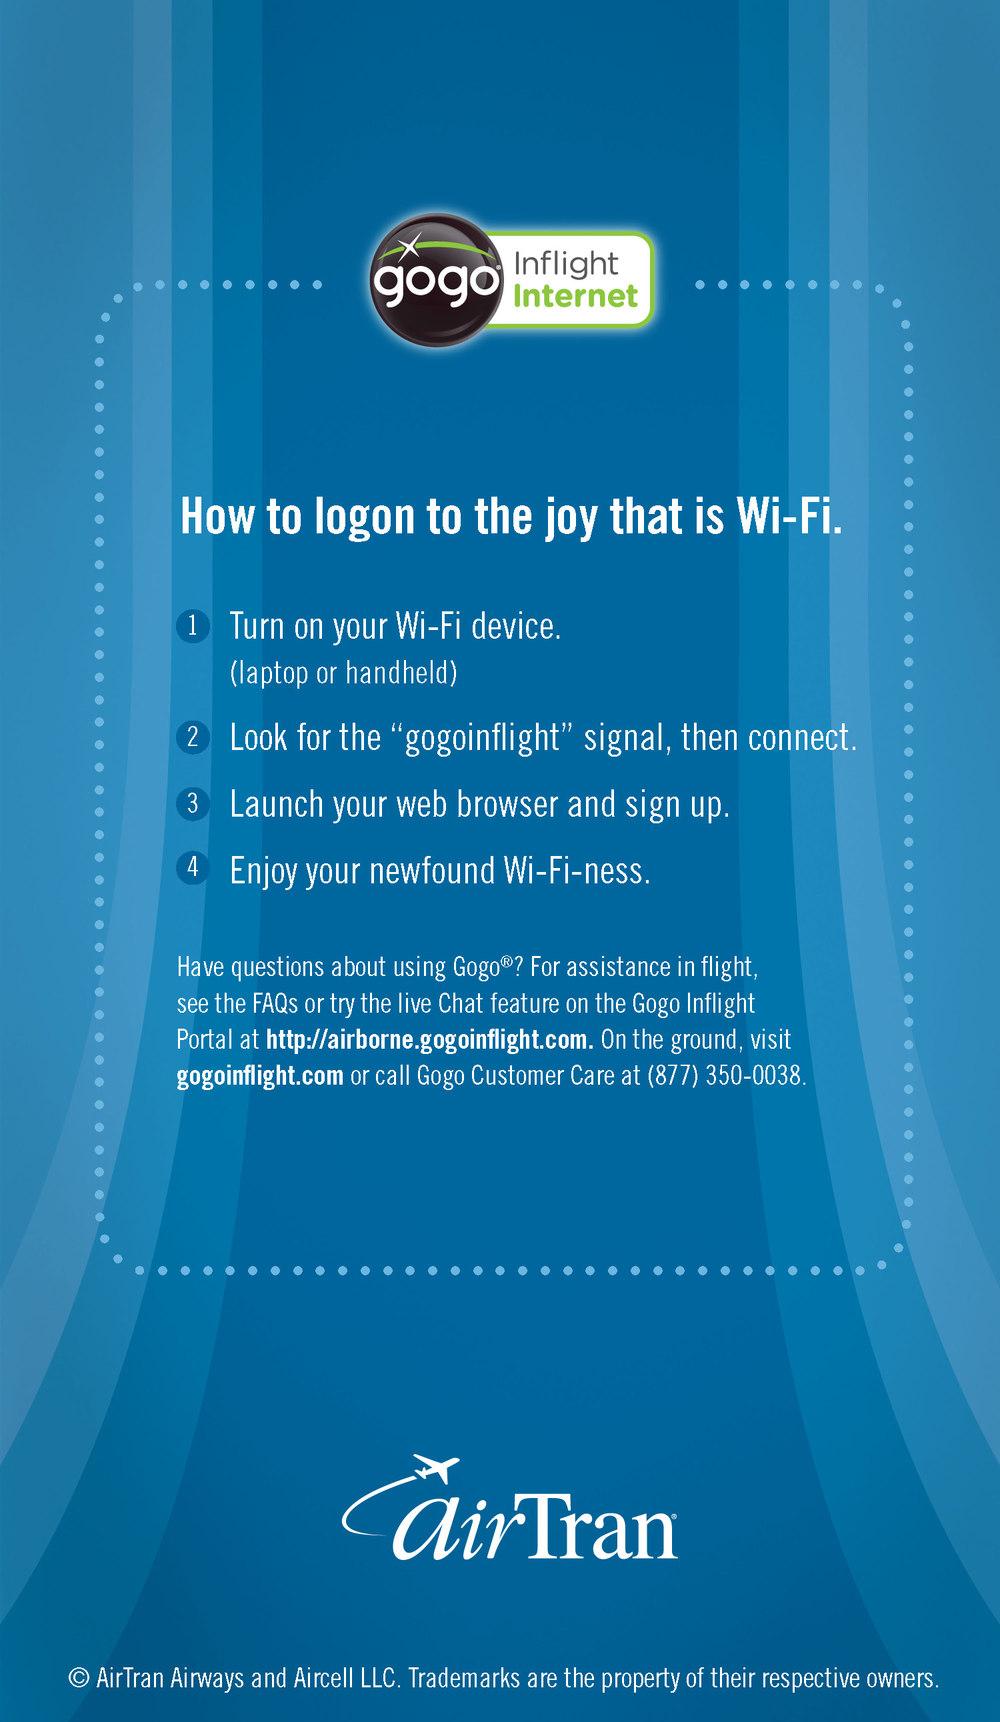 internetiquette brochure back cover